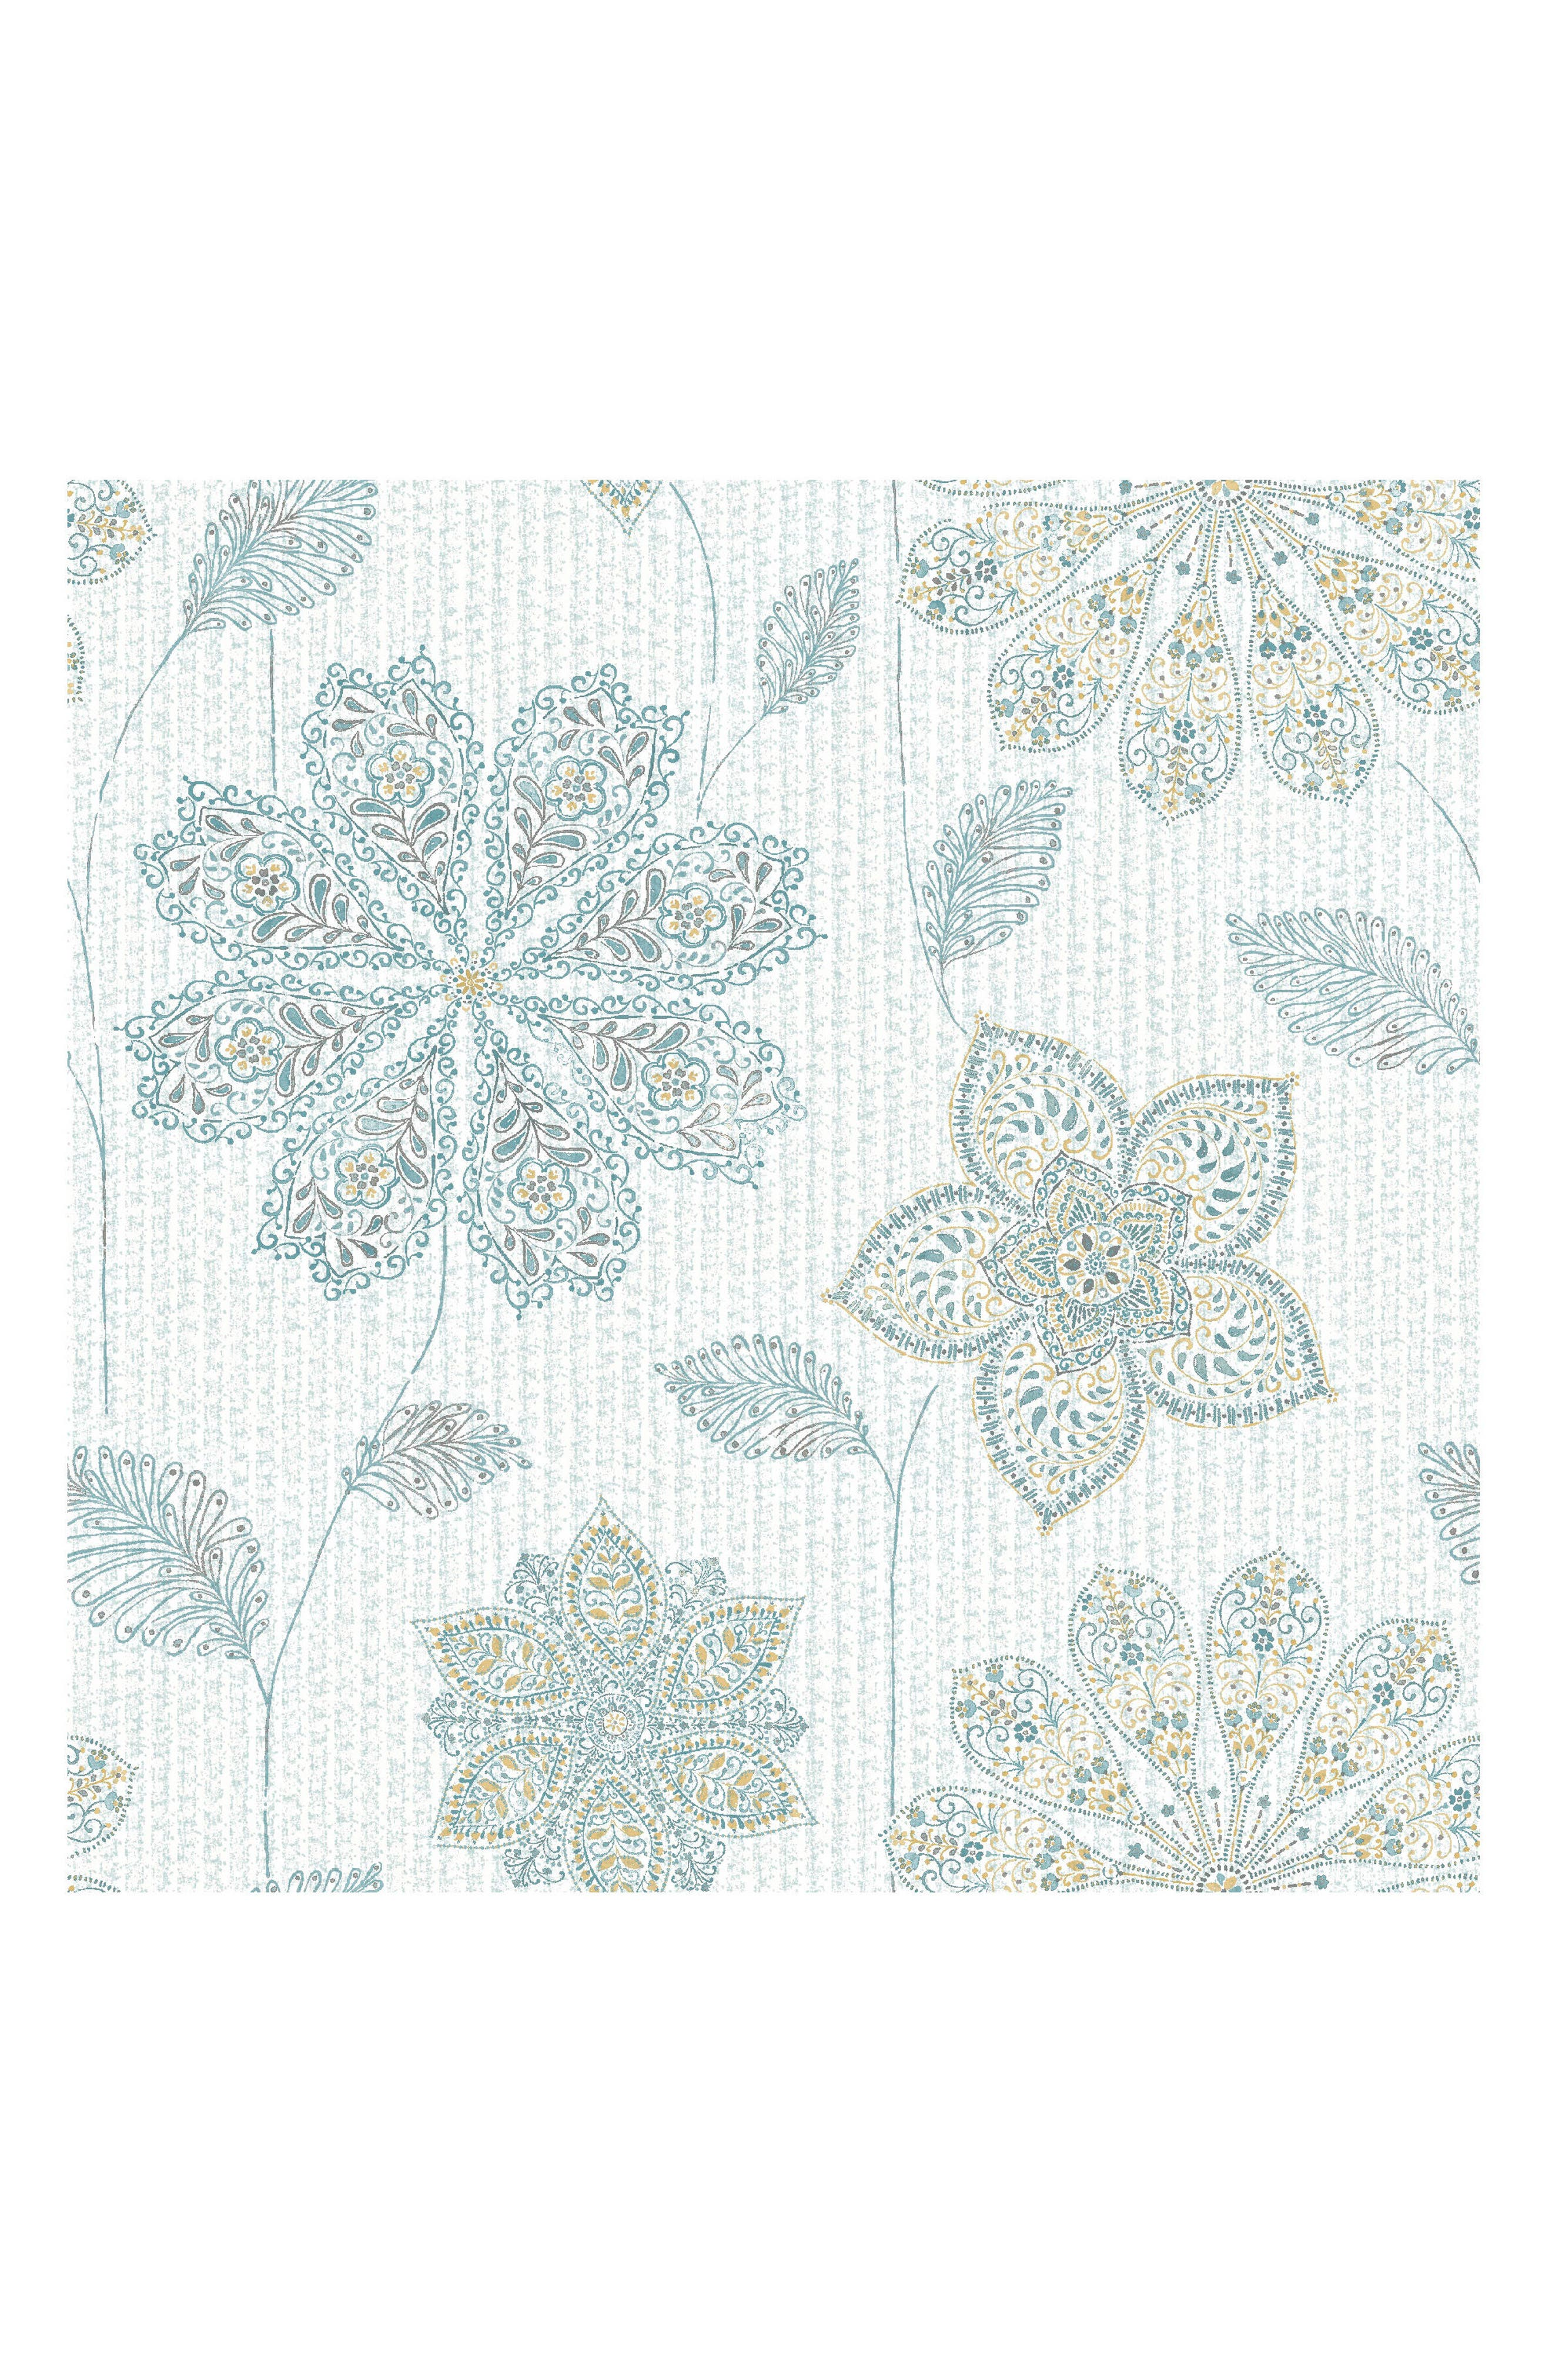 Main Image - Wallpops Floral Peel & Stick Vinyl Wallpaper